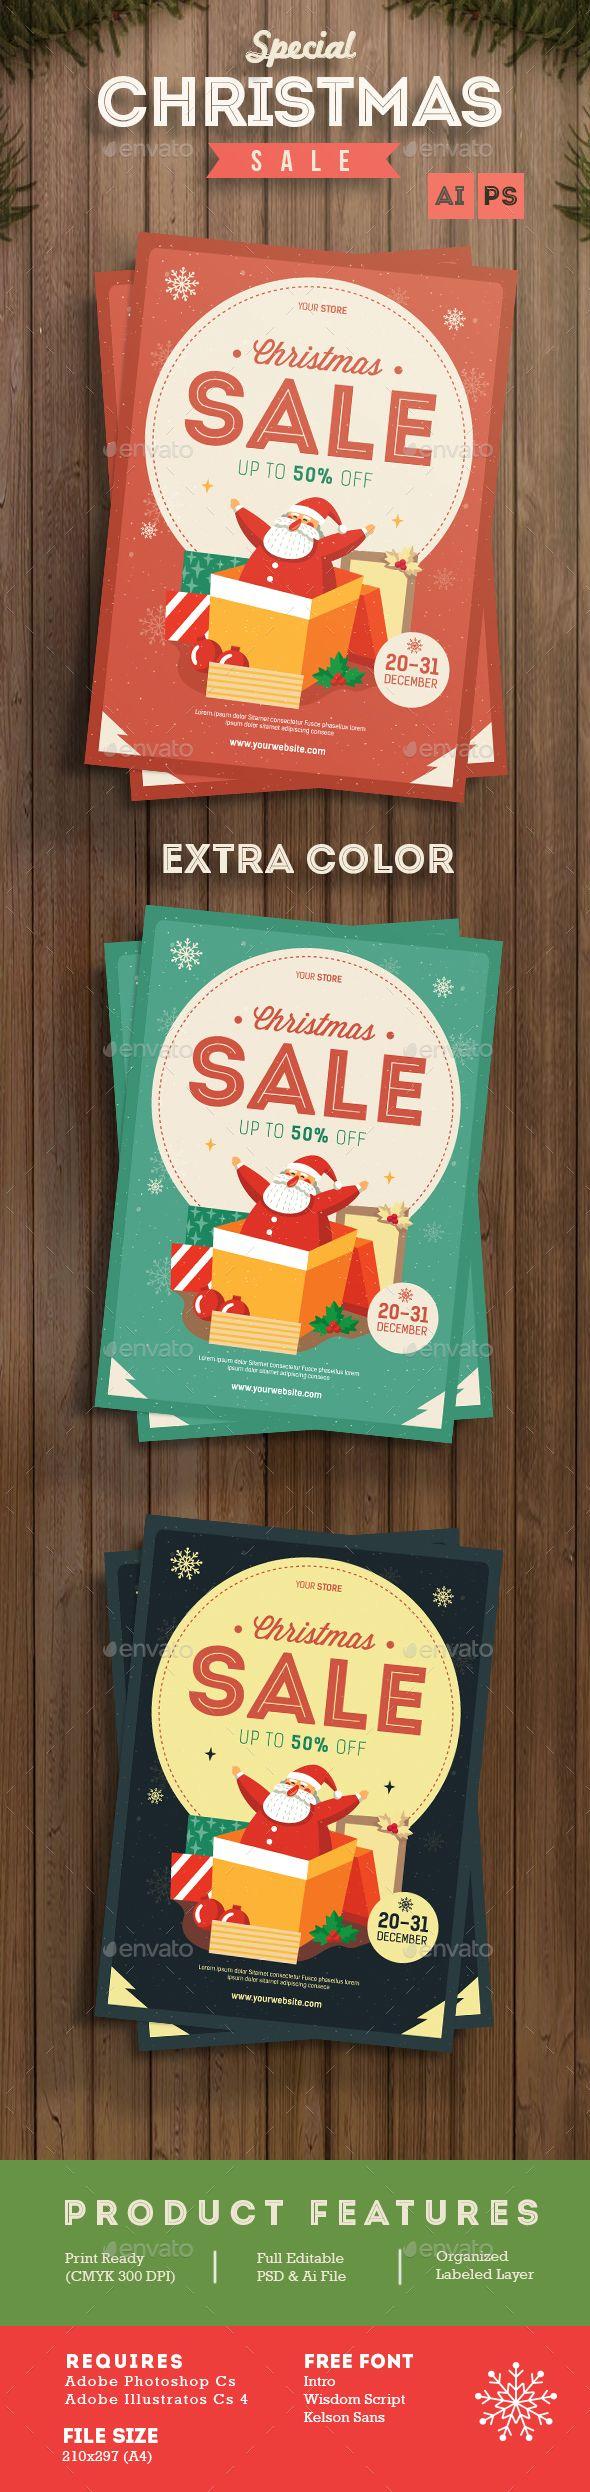 Christmas Sale Flyer Template PSD #design #xmas Download: http://graphicriver.net/item/christmas-sale-flyer/13456947?ref=ksioks